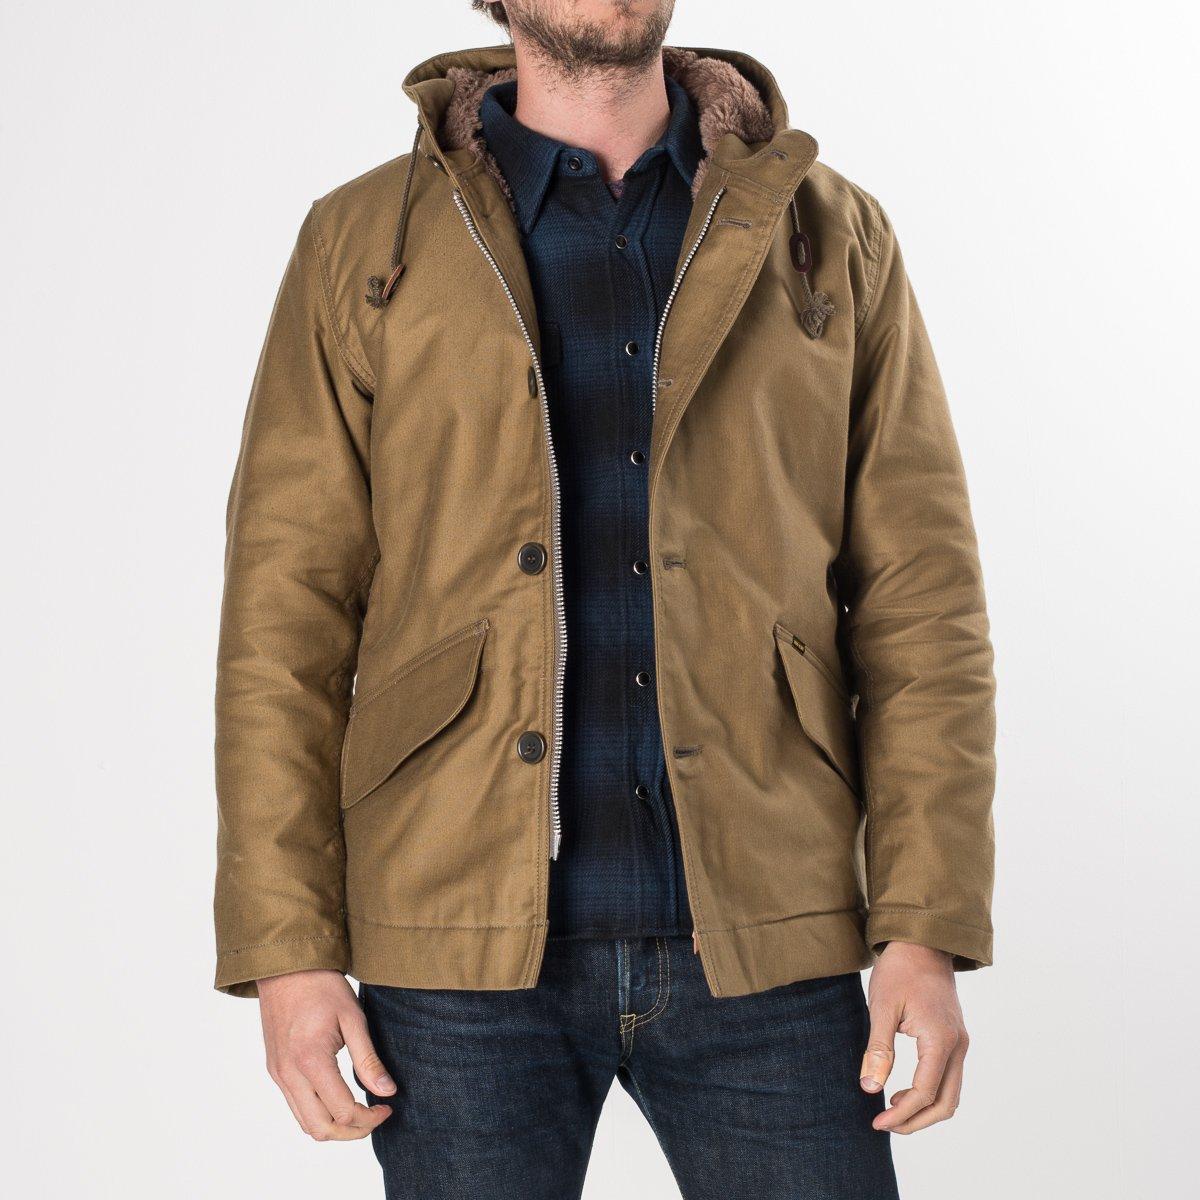 ea985b494be ... Khaki Alpaca Lined Whipcord N1 Deck Half-Coat